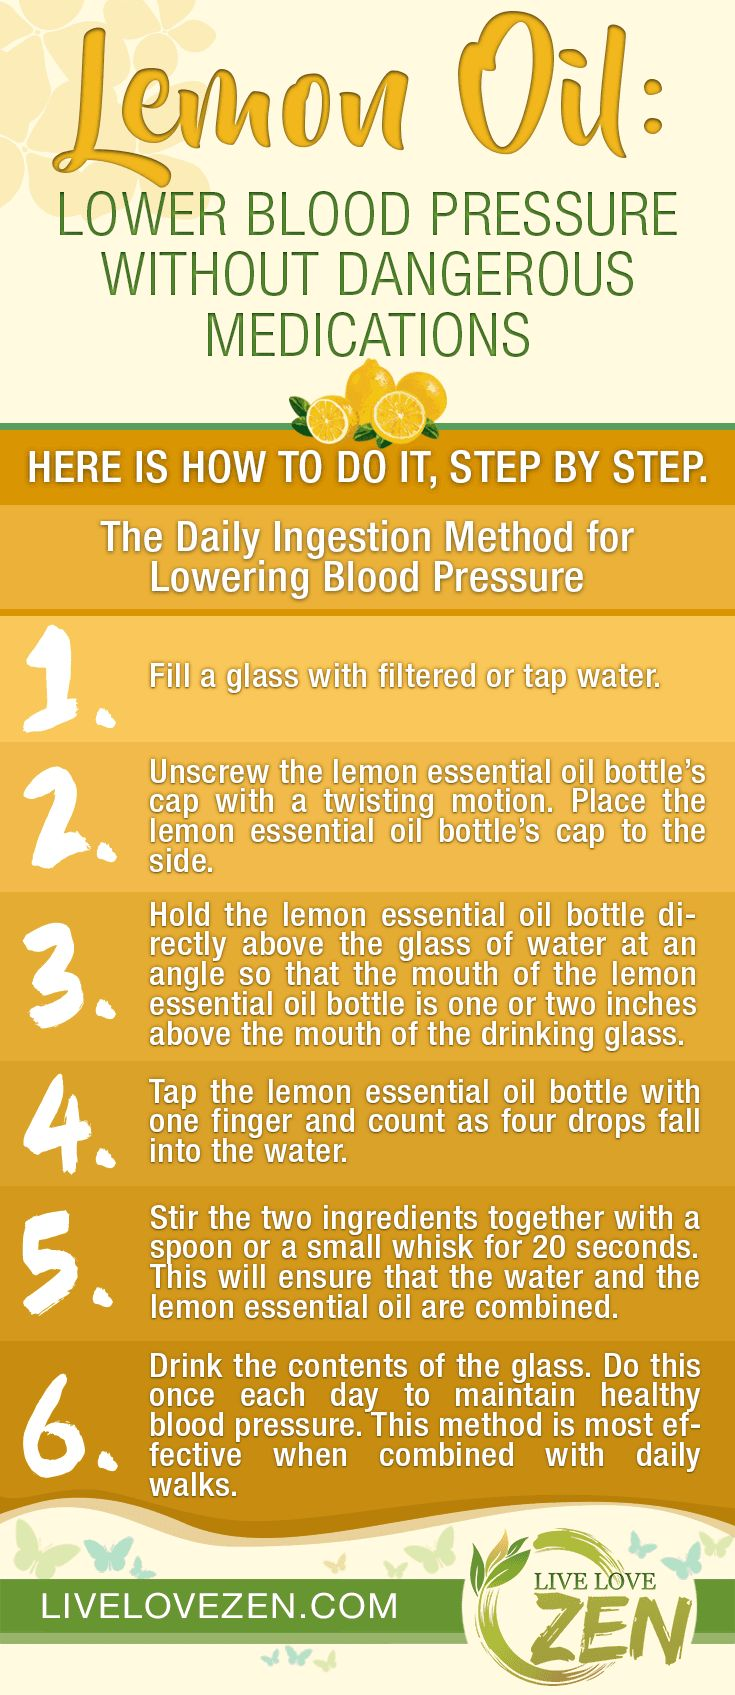 Lemon Oil: Lower Blood Pressure without Dangerous Medications